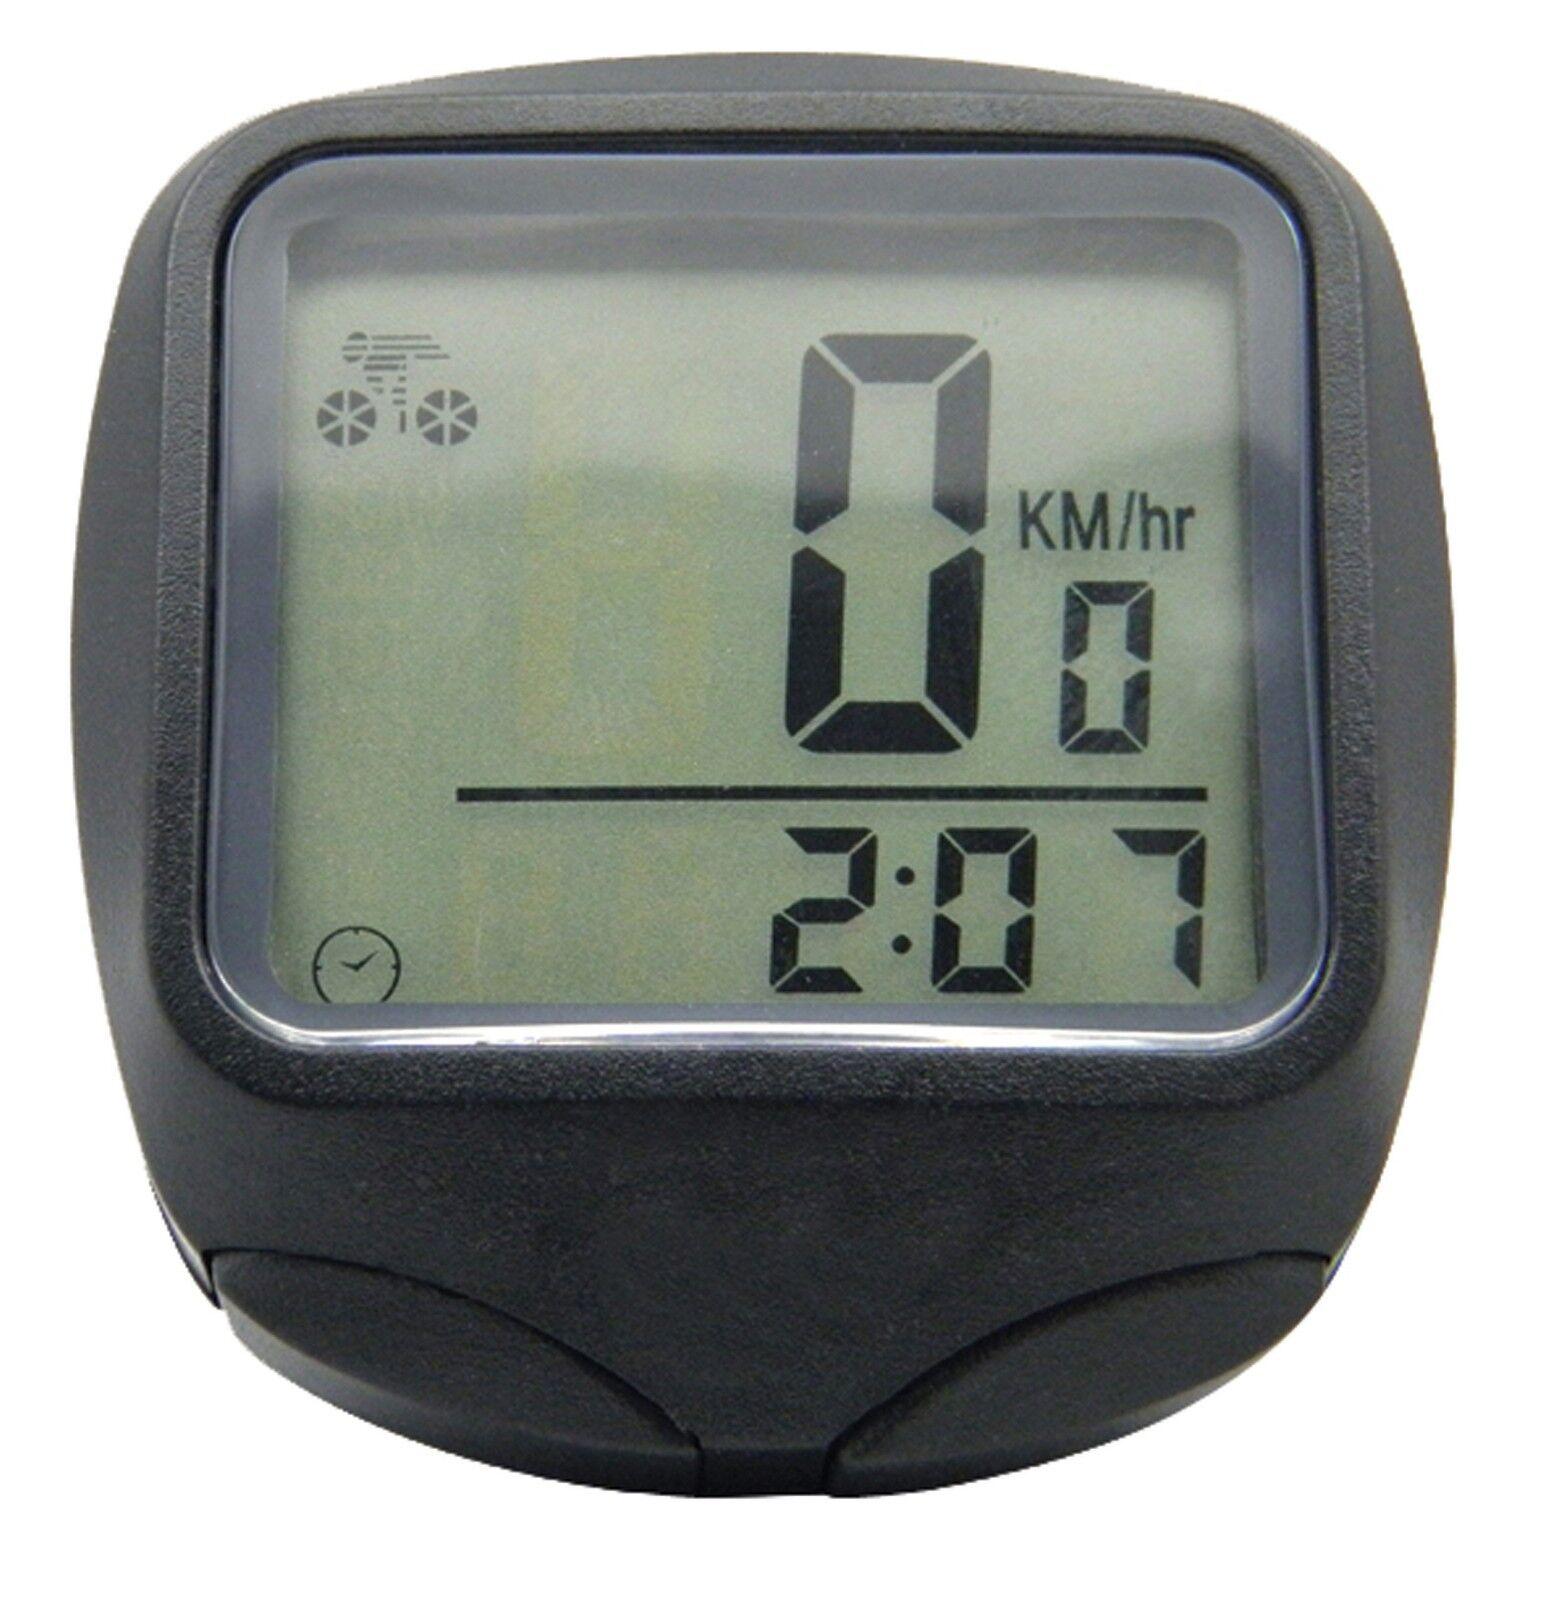 Cycle Bicycle 15 Function Large LCD Display Speedo Odometer Speedometer Computer